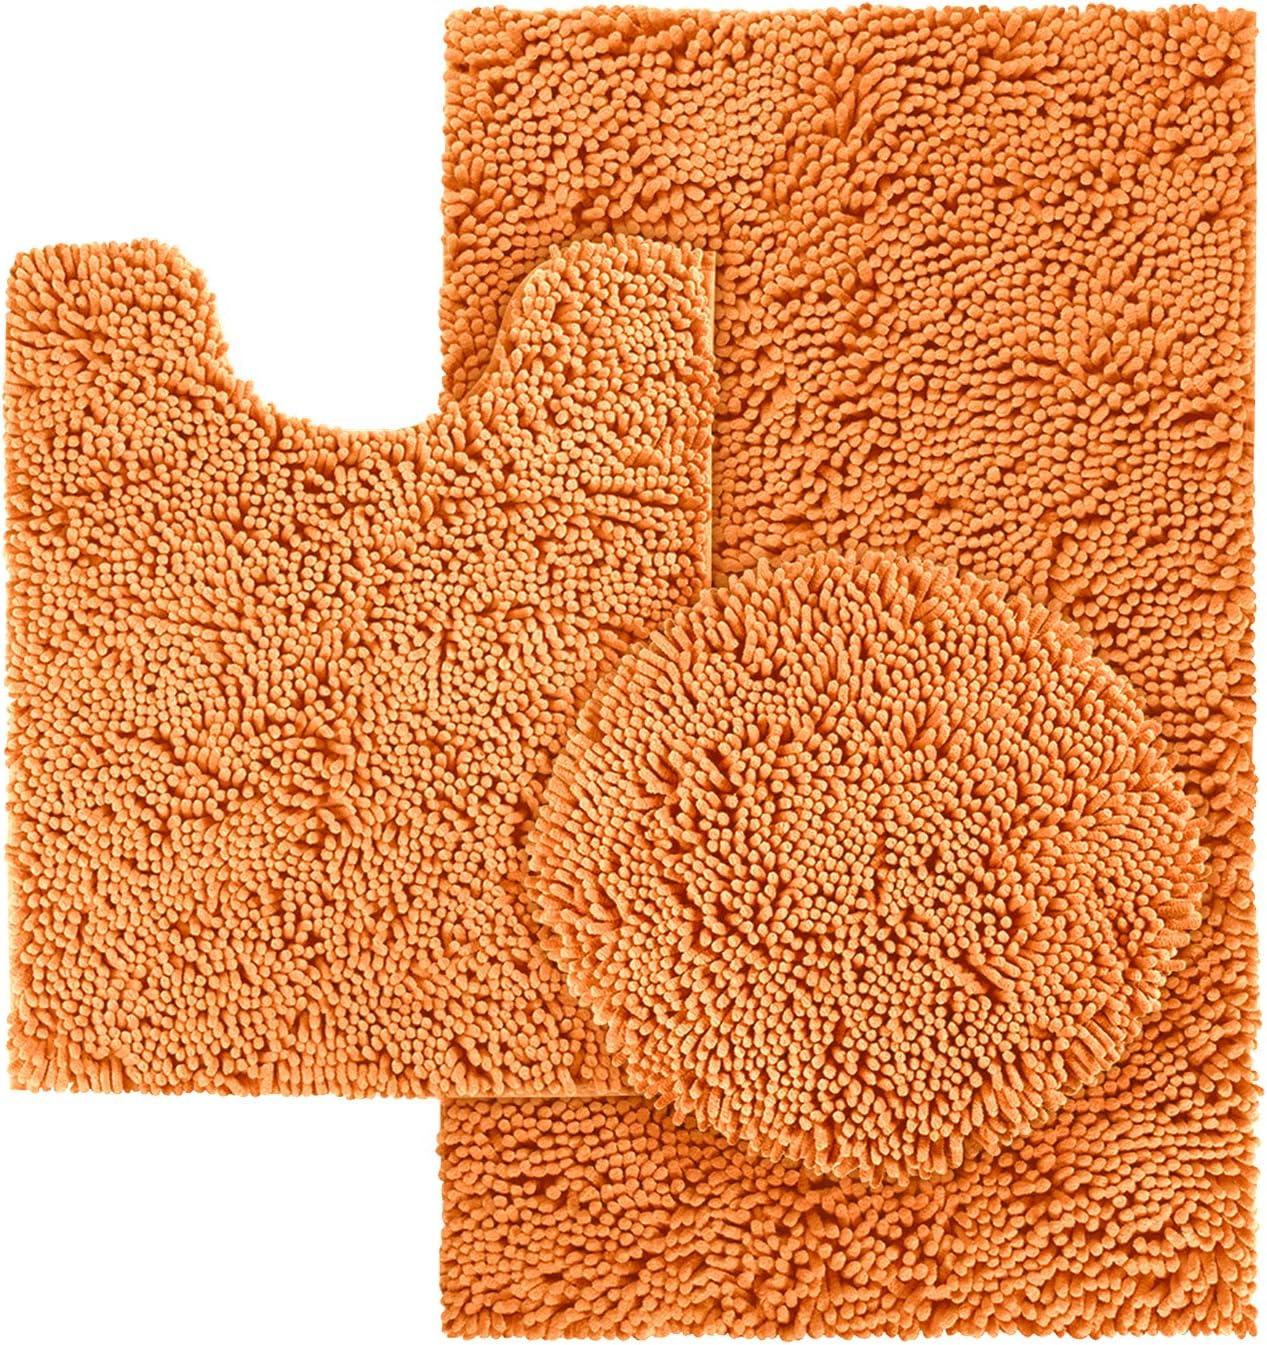 Special sale item HOMEIDEAS 3 Pieces Orange Bathroom Rugs Set Non Max 50% OFF Soft Ultra Slip